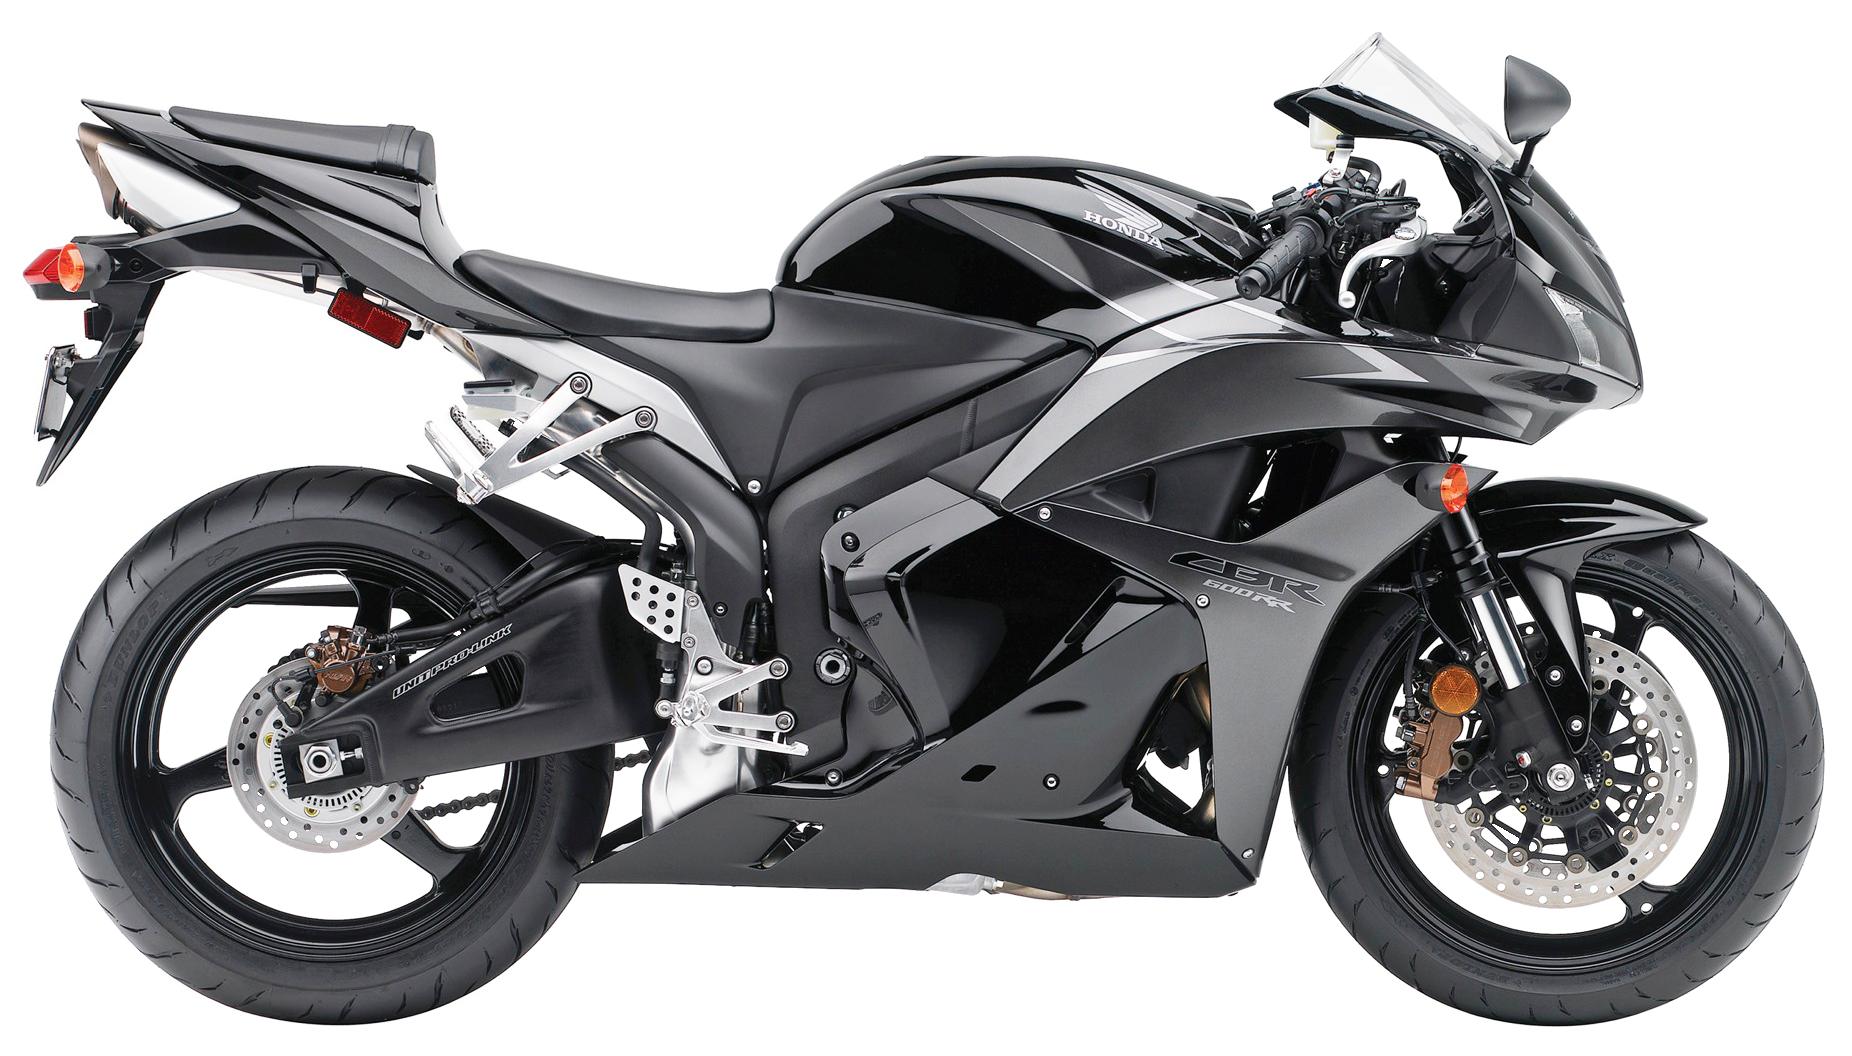 Black Honda CBR 600RR PNG Image